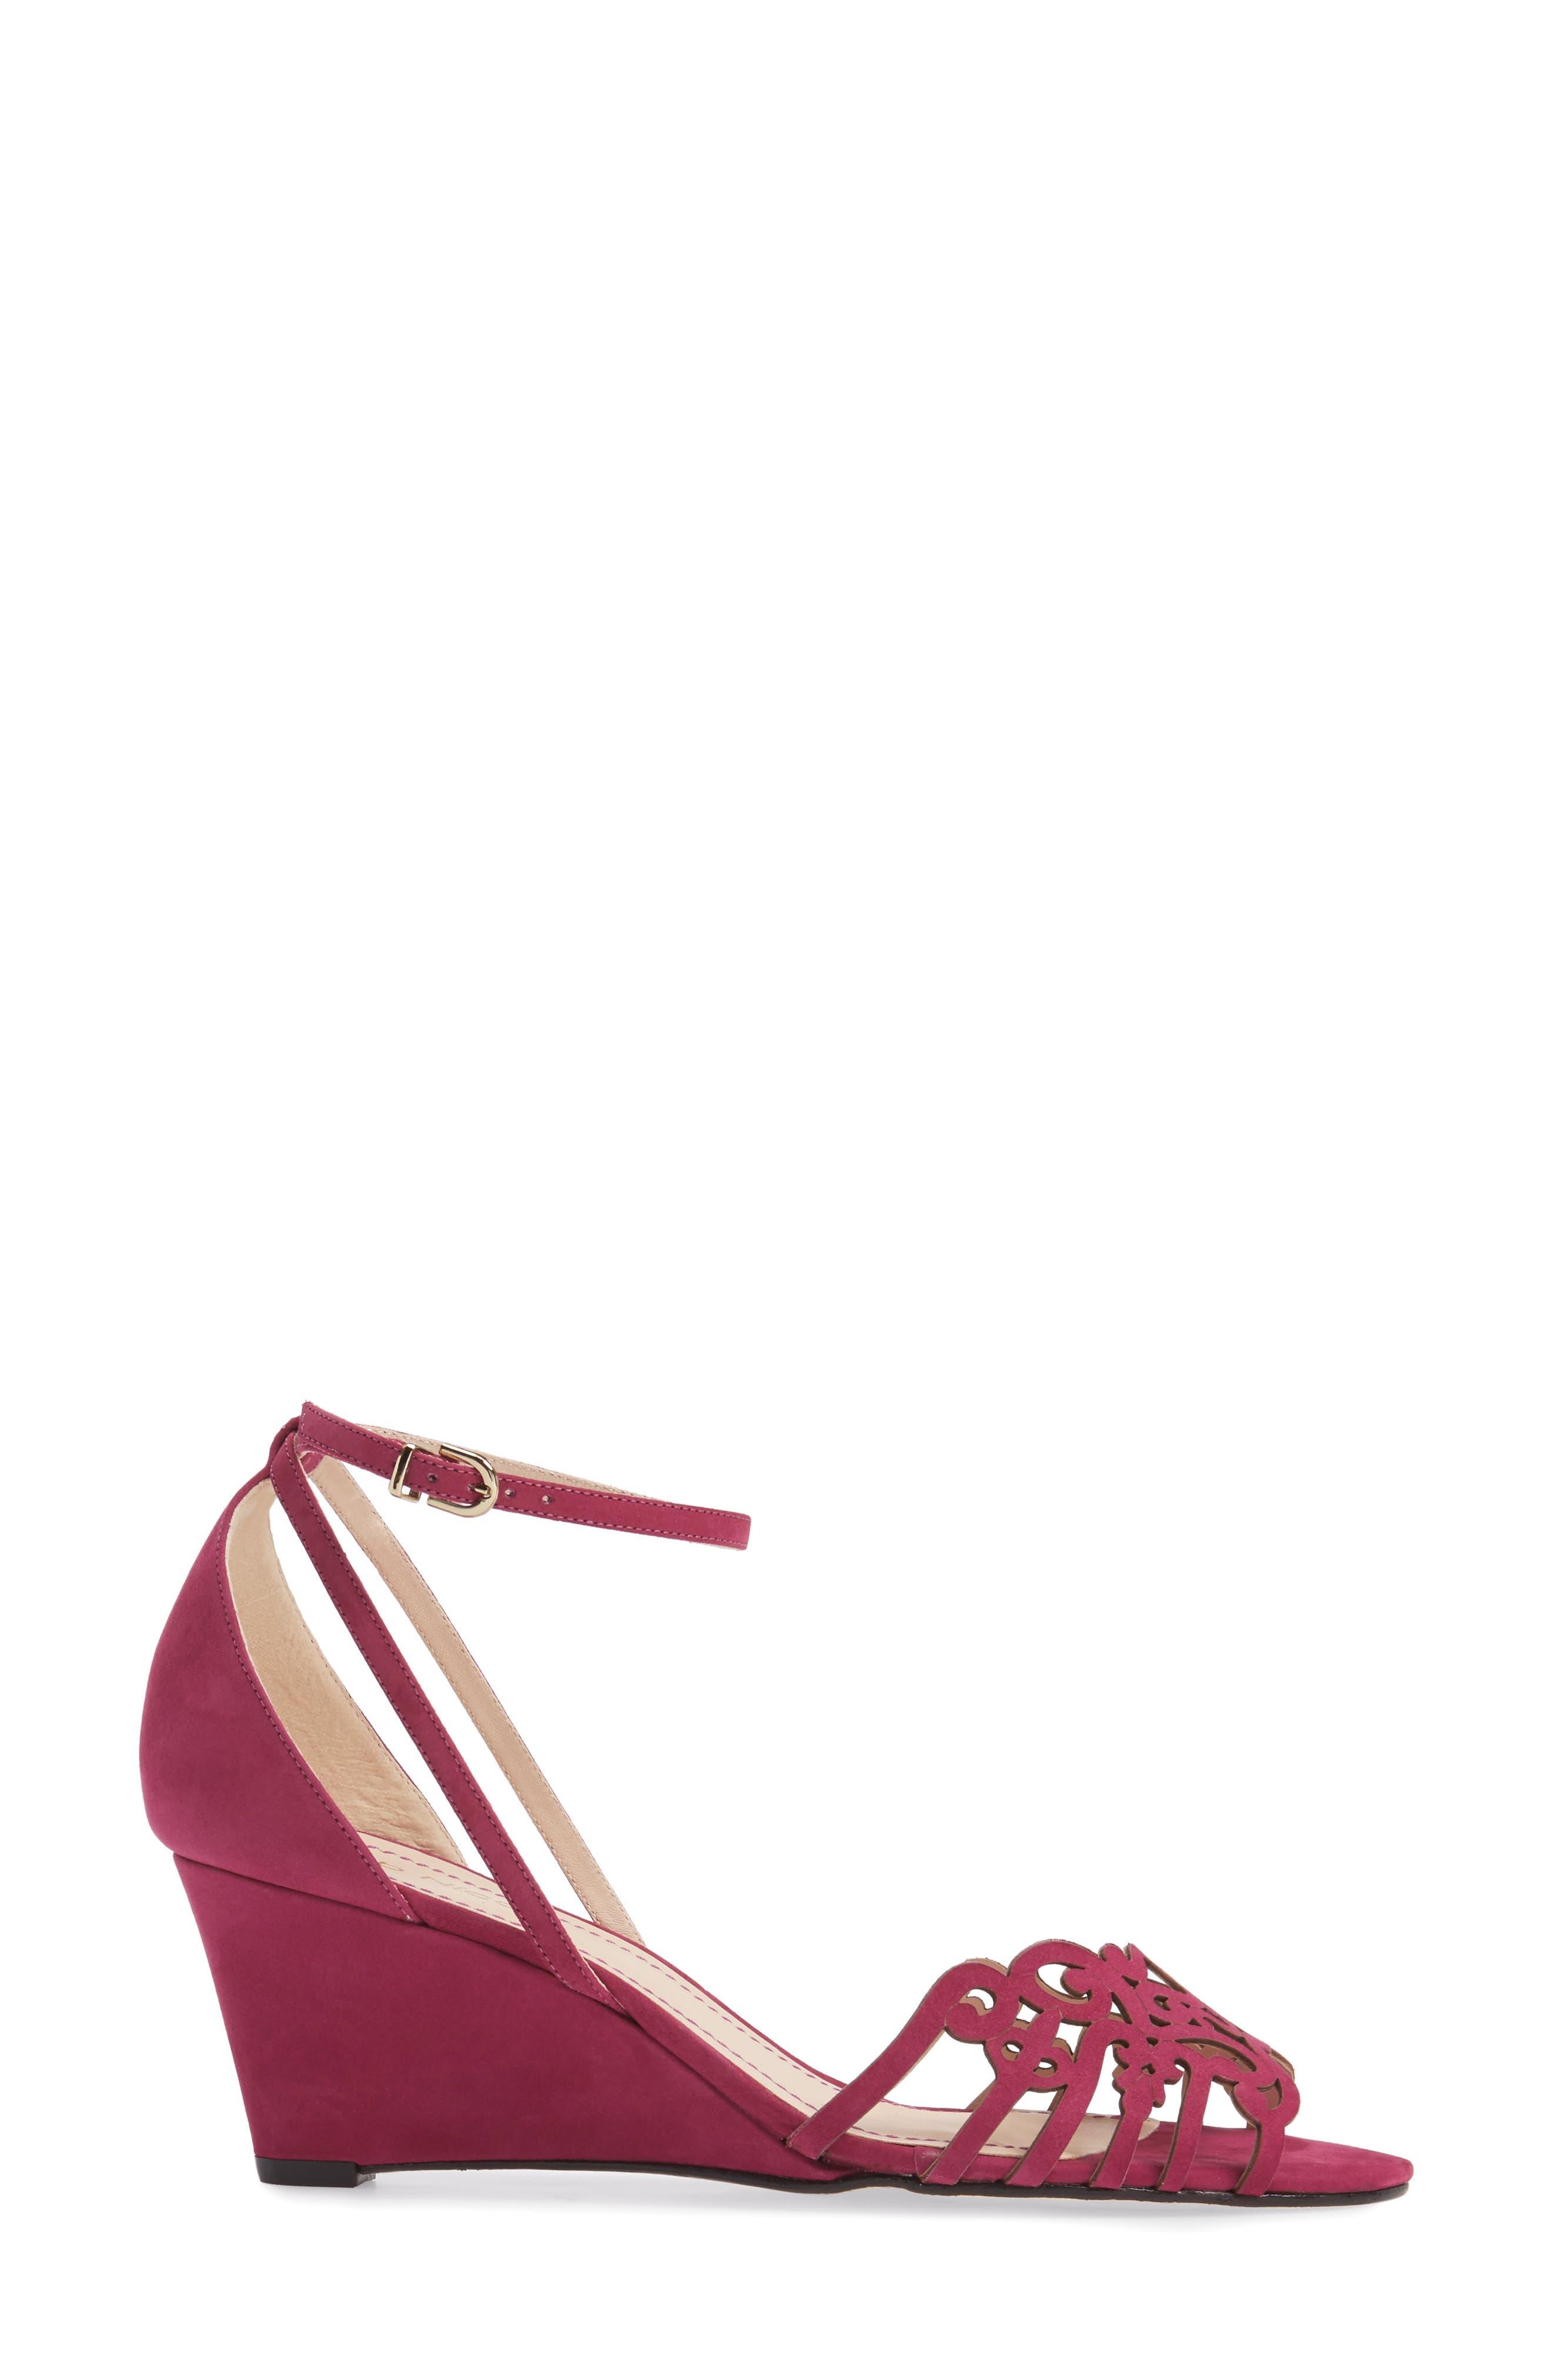 Alternate Image 3  - Klub Nico 'Kingston' Ankle Strap Wedge Sandal (Women)